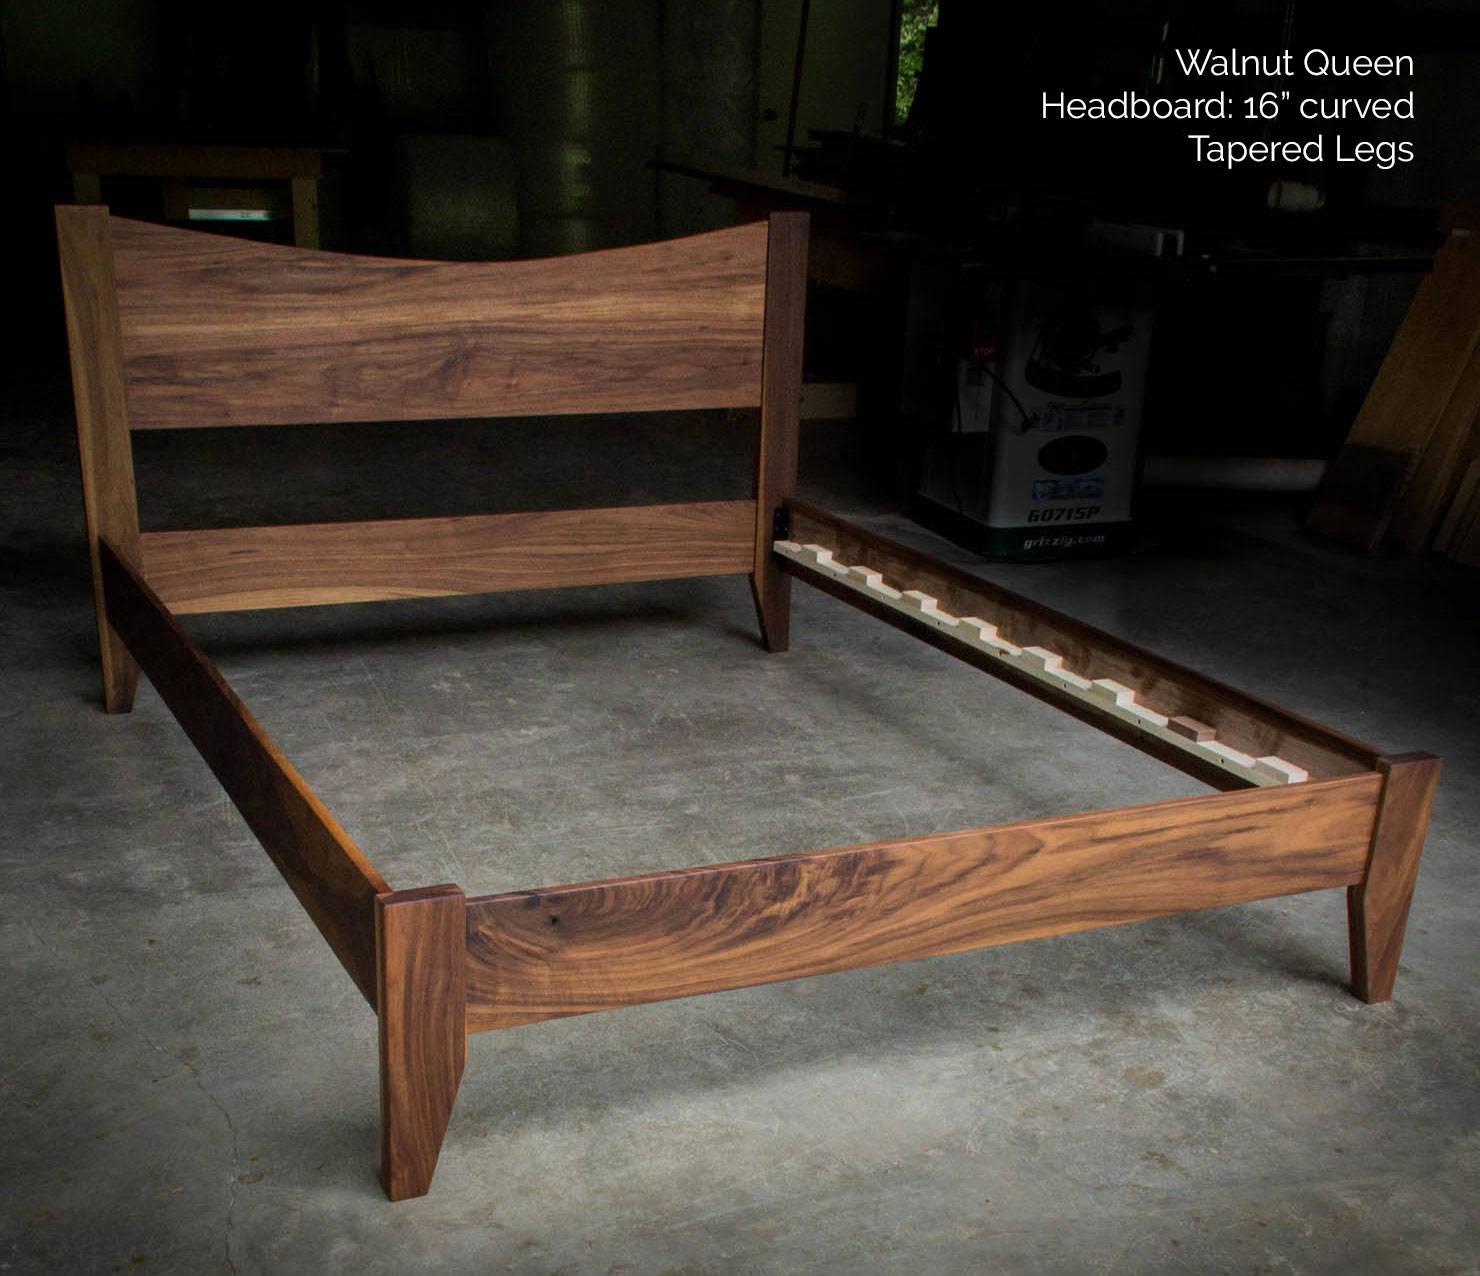 Walnut Simple Platform Bed Frame With Curved Headboard Custom